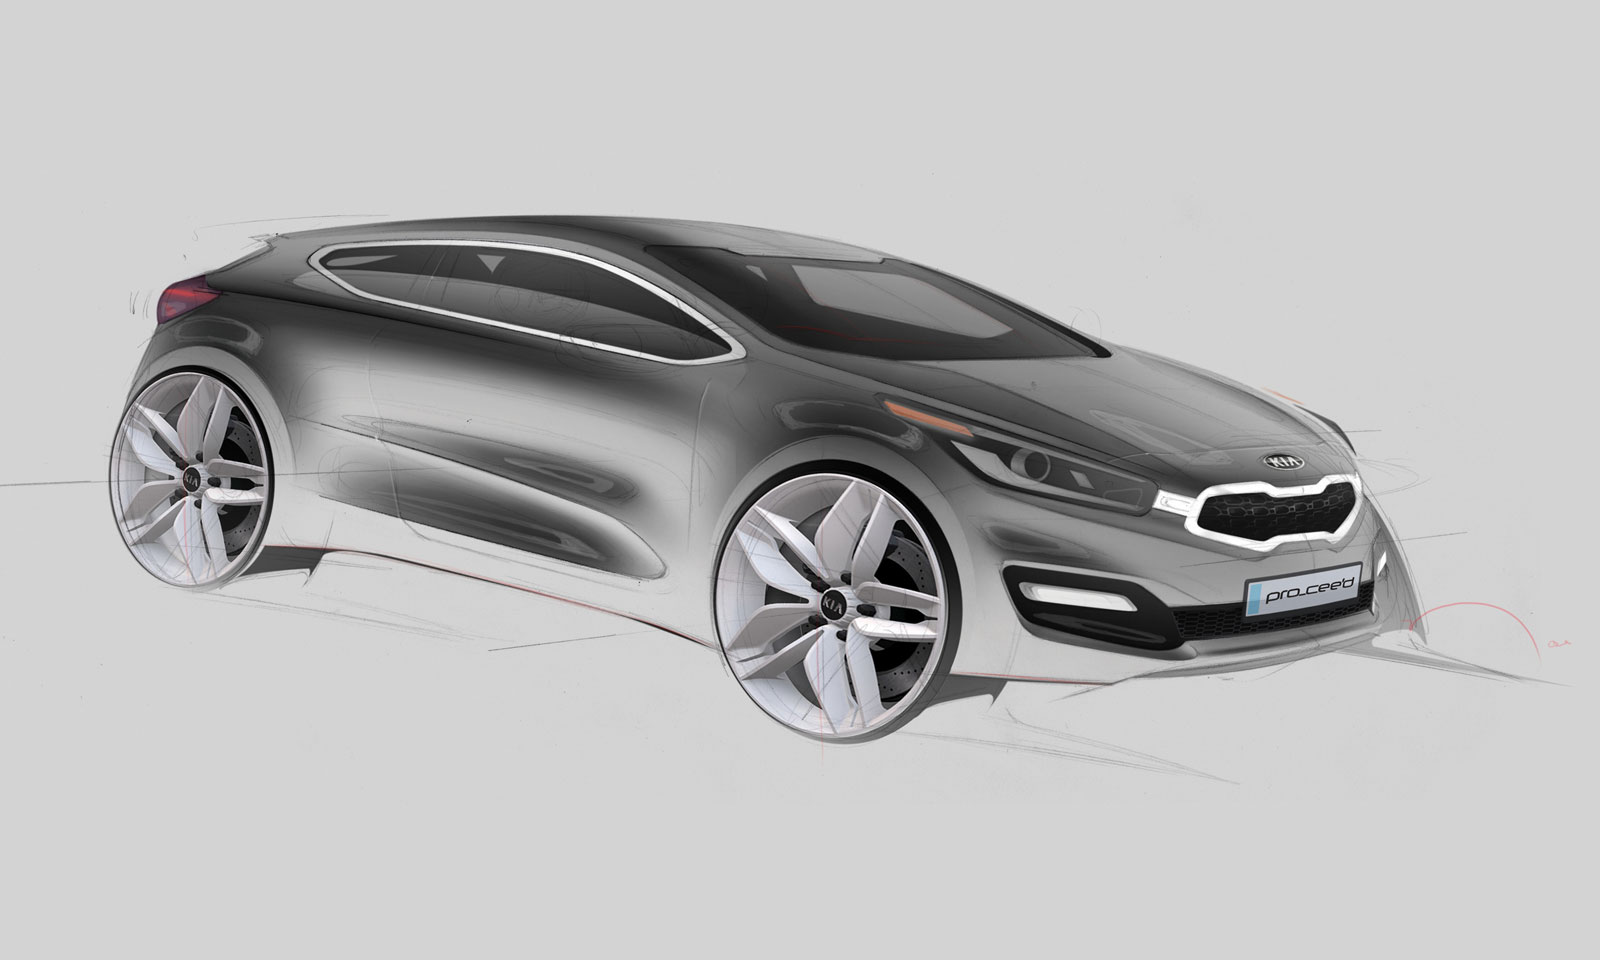 2012 Kia Pro Cee D Design Sketch Car Body Design